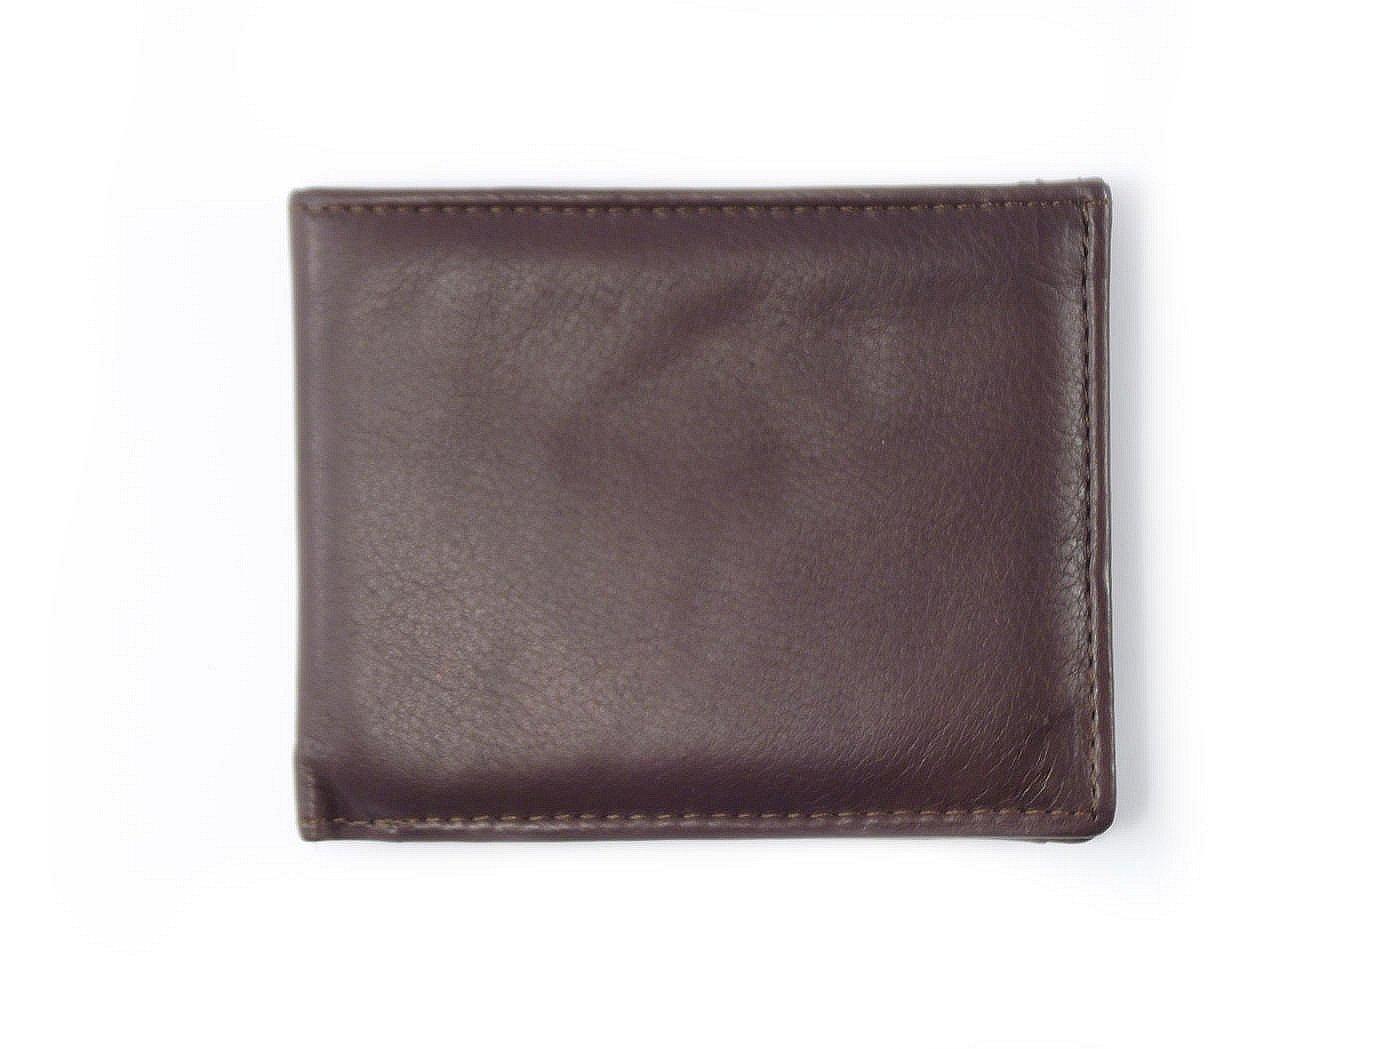 ac9eb9adf554 Wallet 14 Cards HPMW17NTKU - genuine leather billfold wallet by Der  Lederhandler